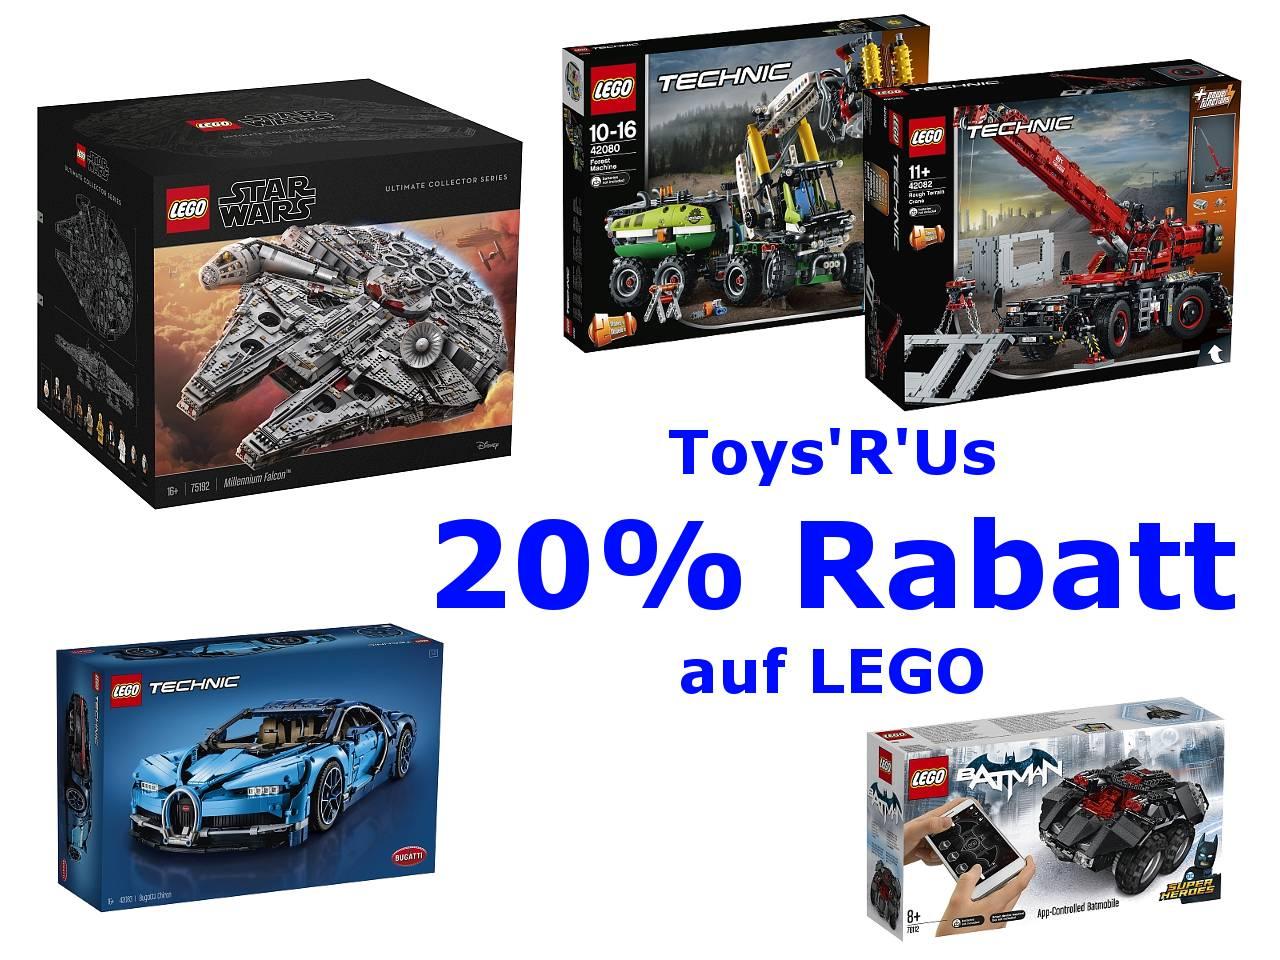 Toys R Us Lego Rabatt